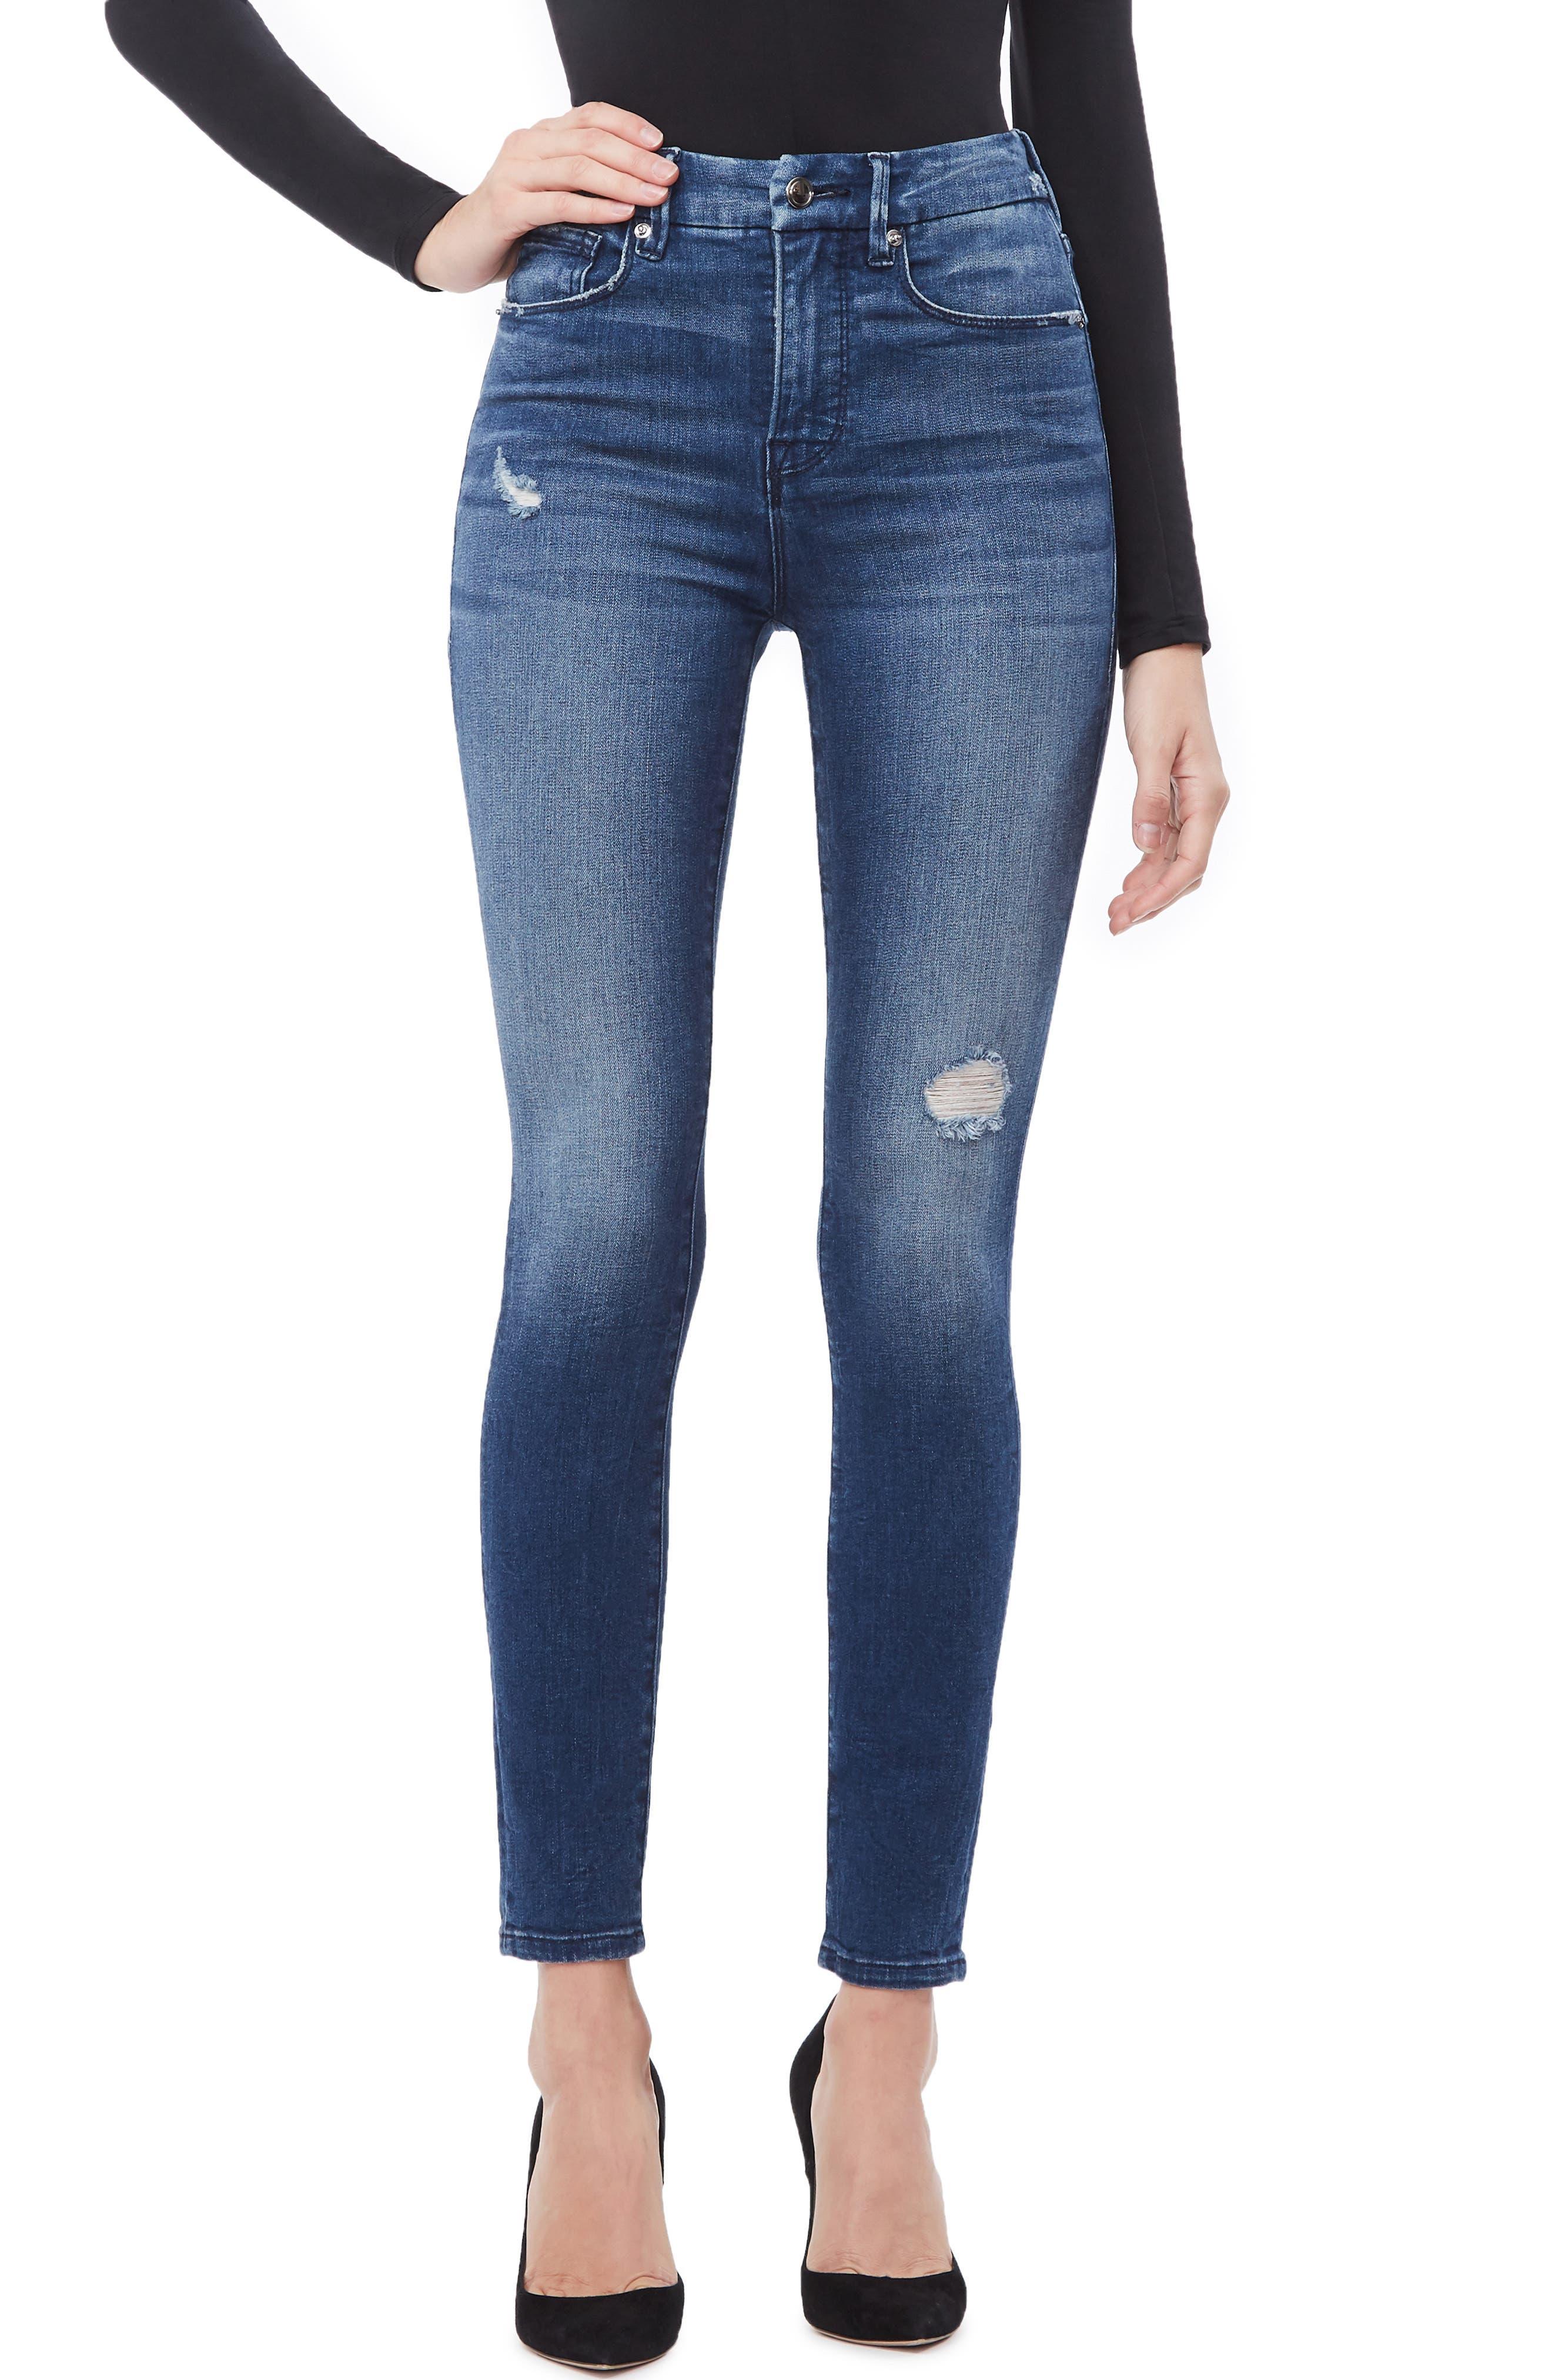 GOOD AMERICAN Good Waist High Waist Skinny Jeans, Main, color, BLUE249